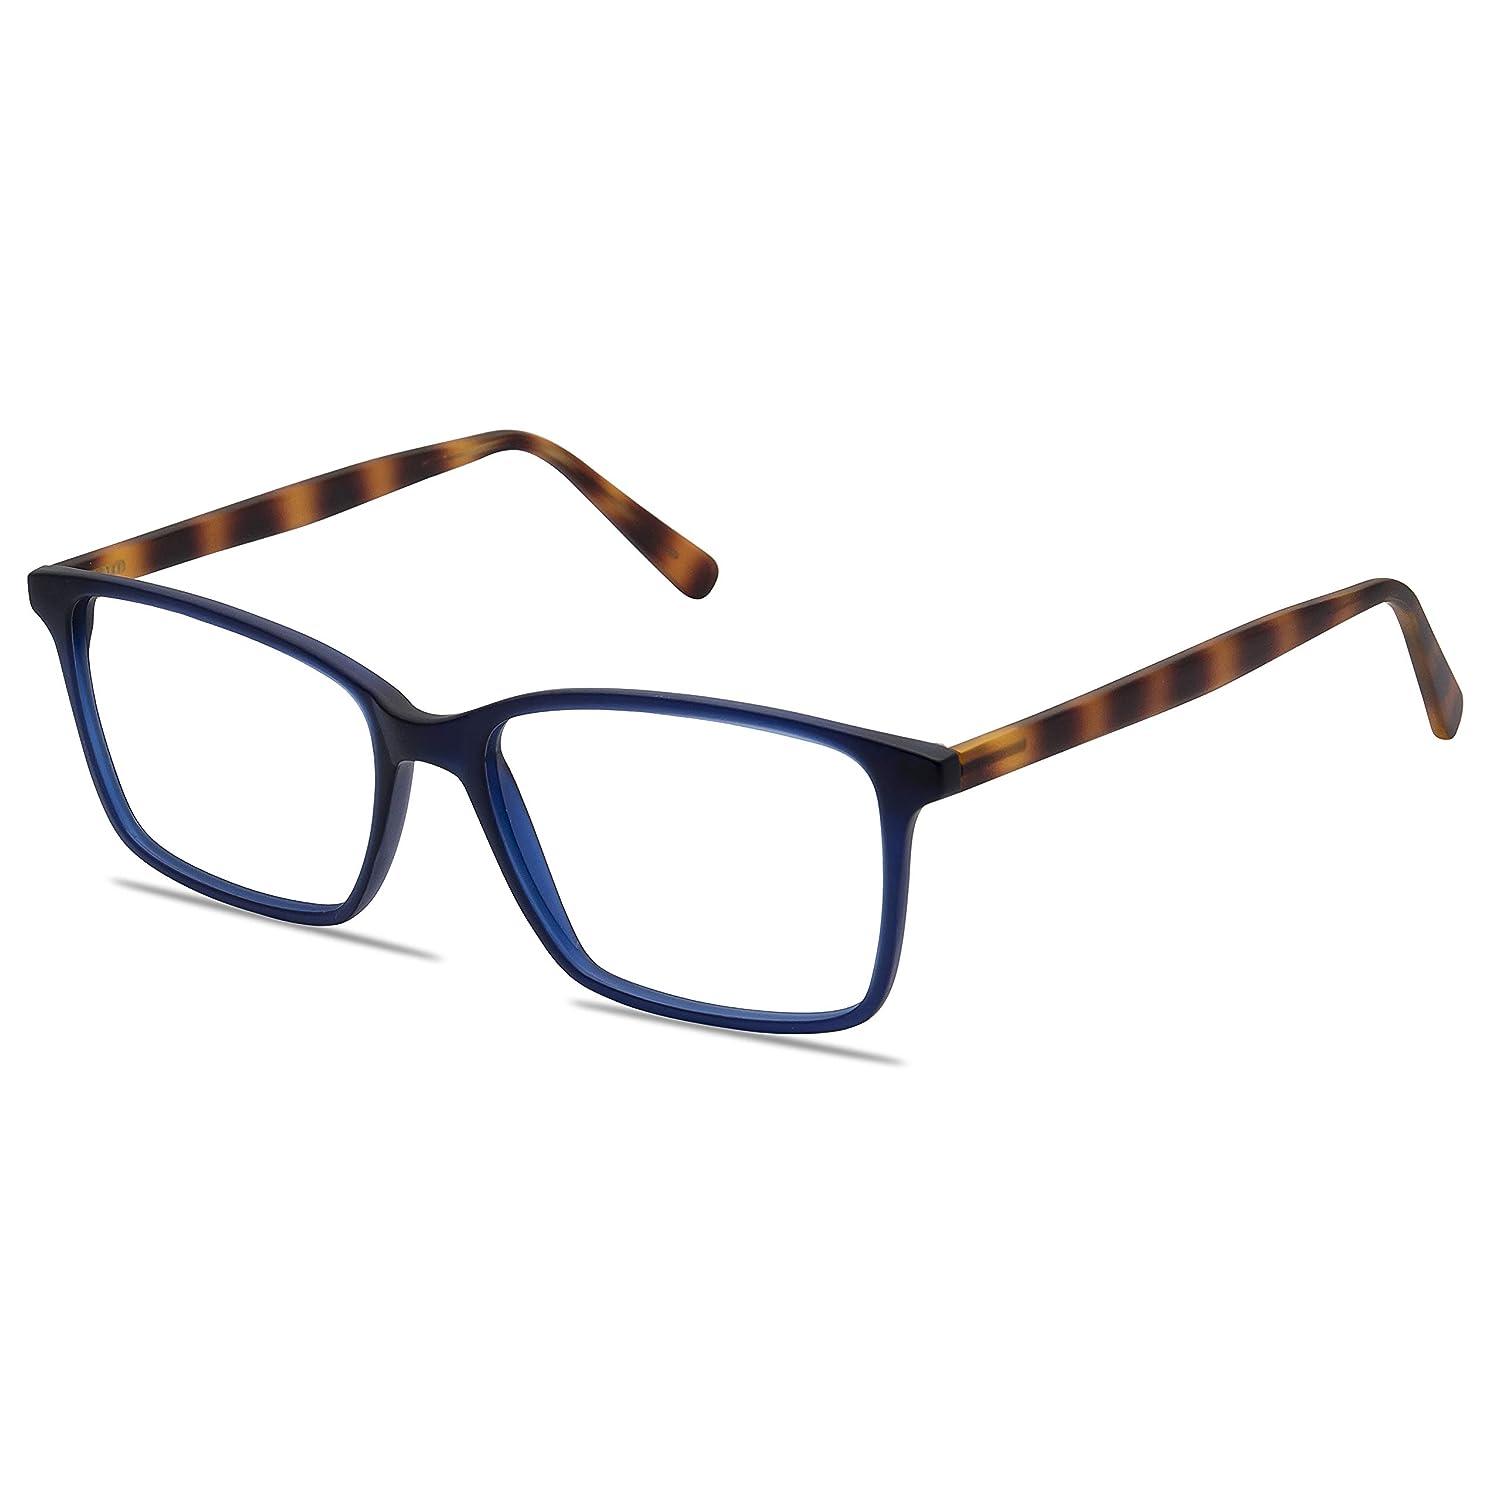 Blue Light Blocking Glasses with Anti-Glare,Cut UV400 Transparent Lens,Computer Reading Glasses,Anti Eyestrain/Anti Scratch/Anti Smudgy,Sleep Better for Women/Men WR12 (Navy Blue)